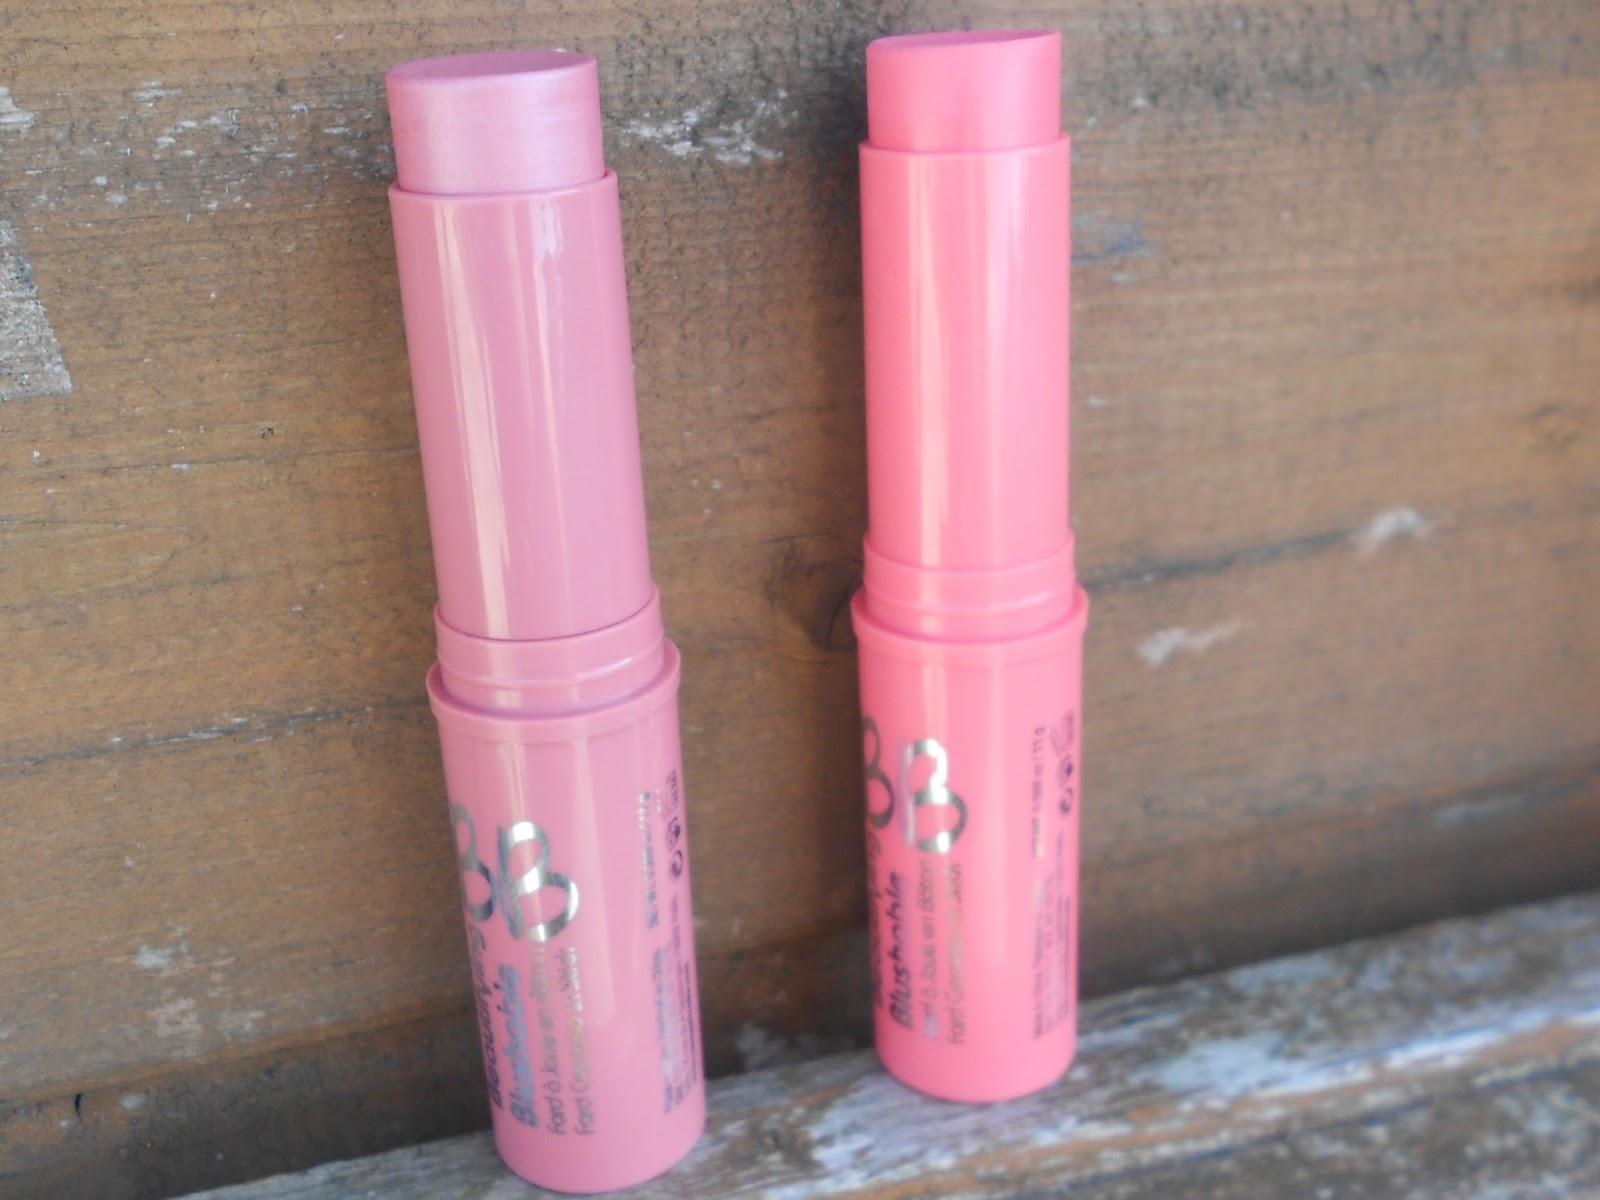 nyc cream bb blush swatches soho pink neverending pink